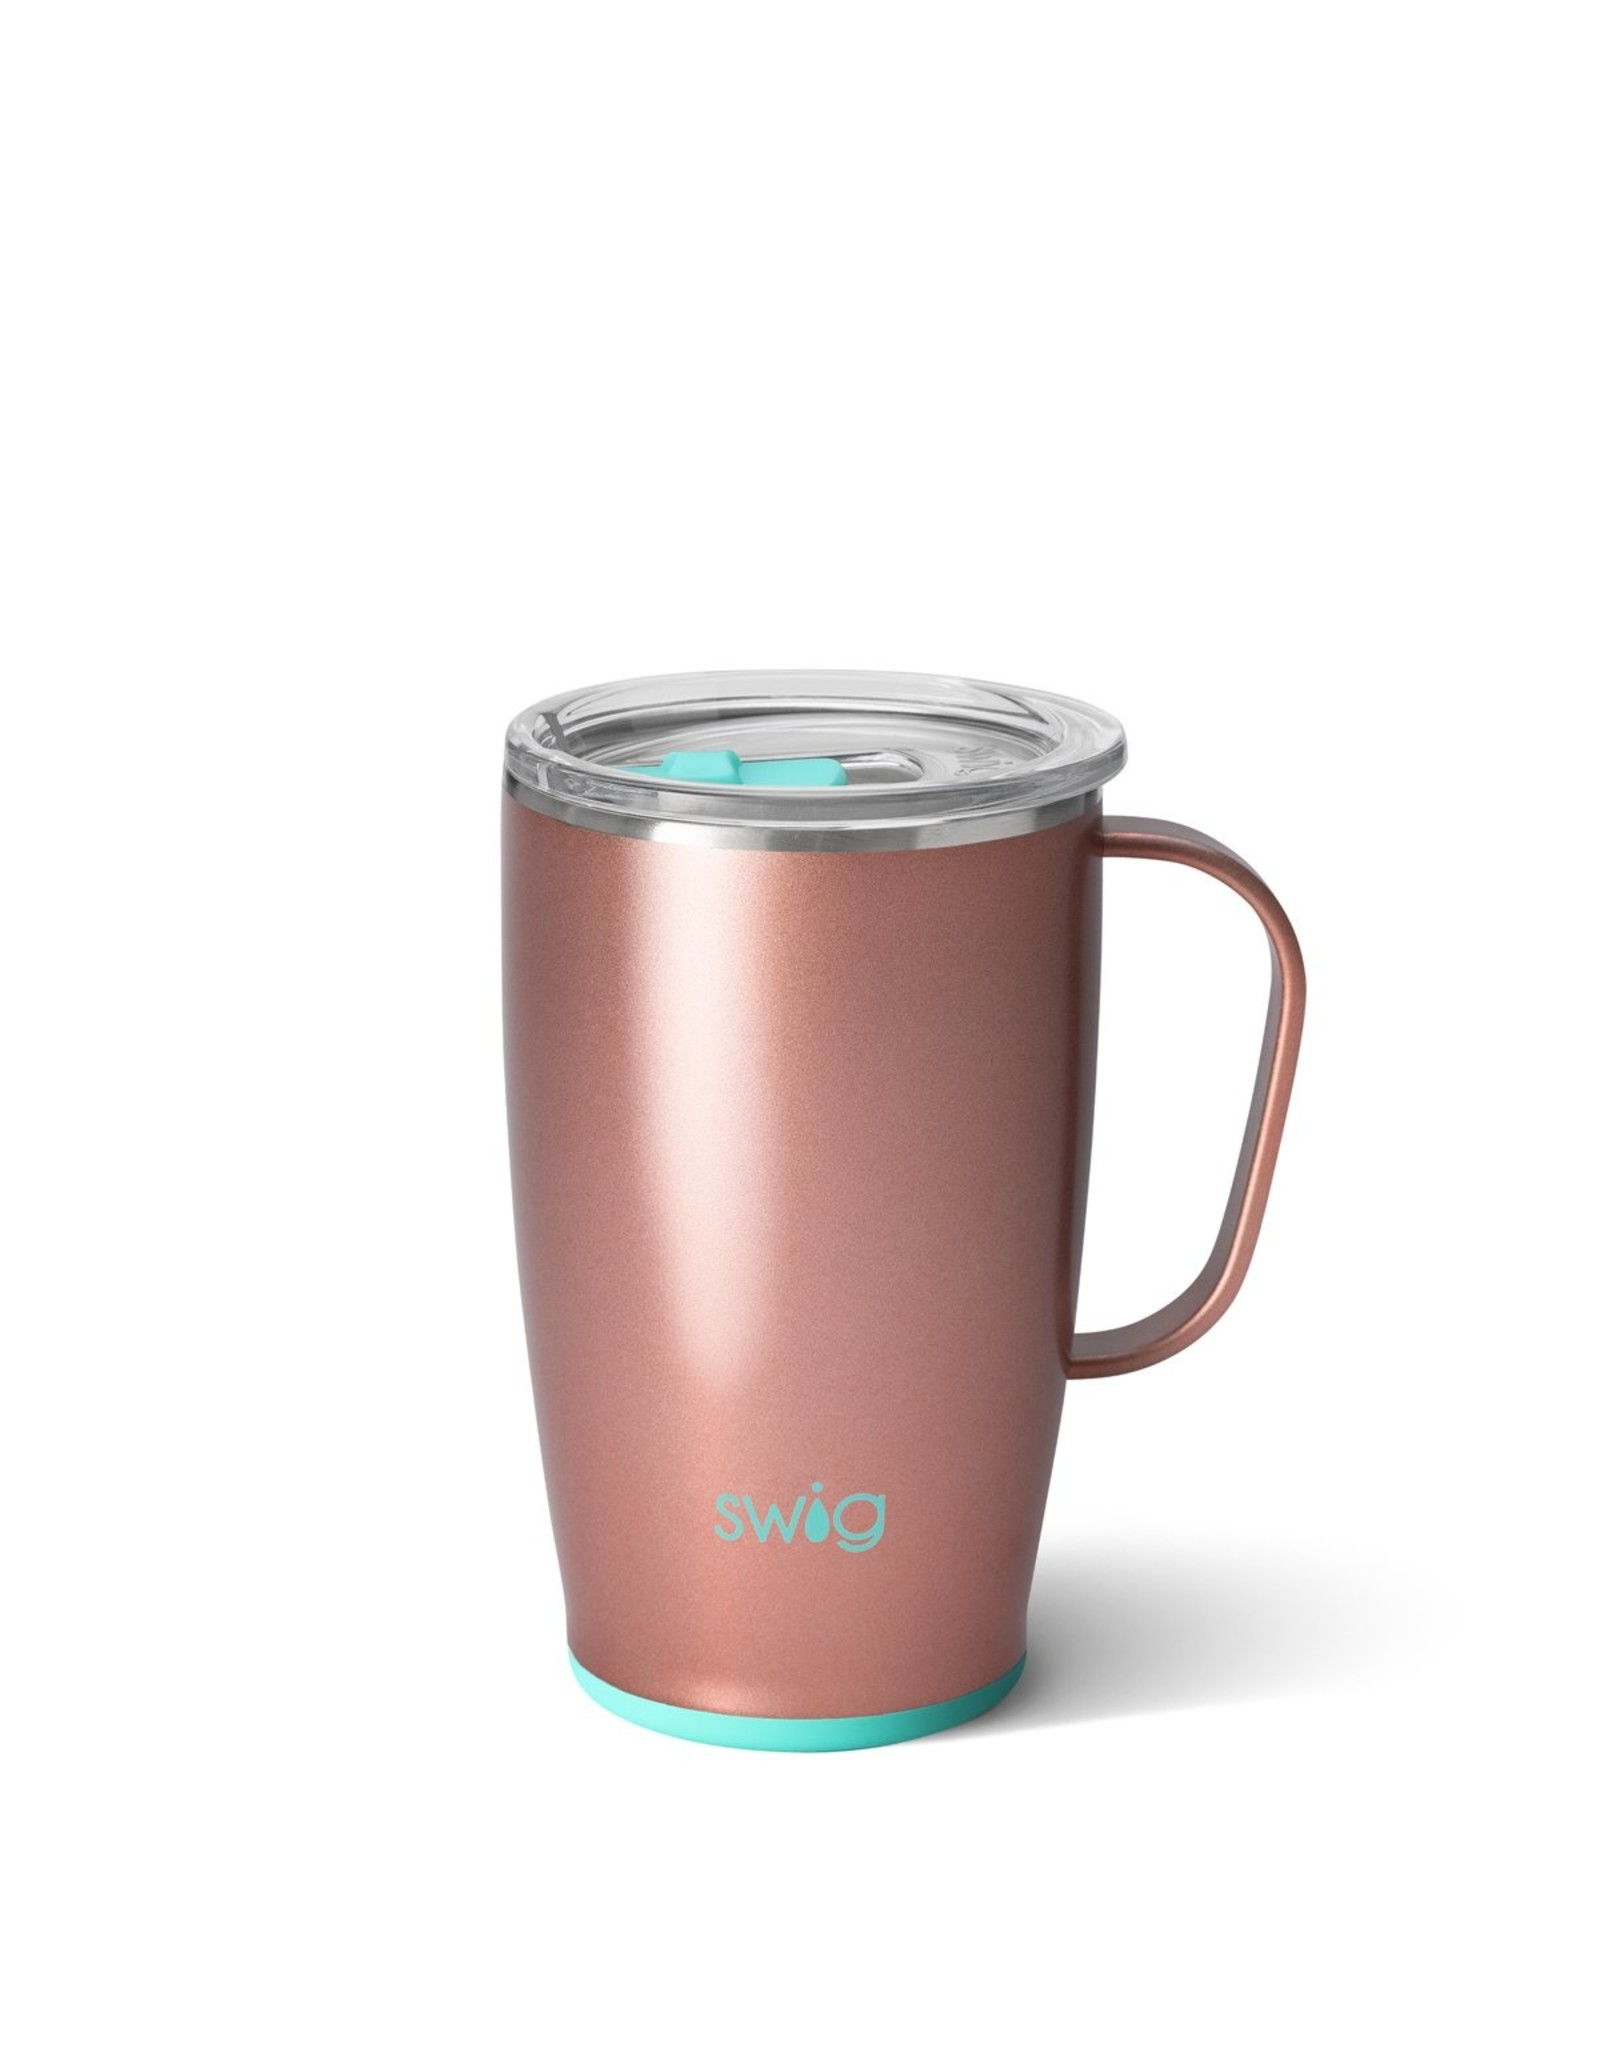 Swig 18 oz Mug - Rose Gold